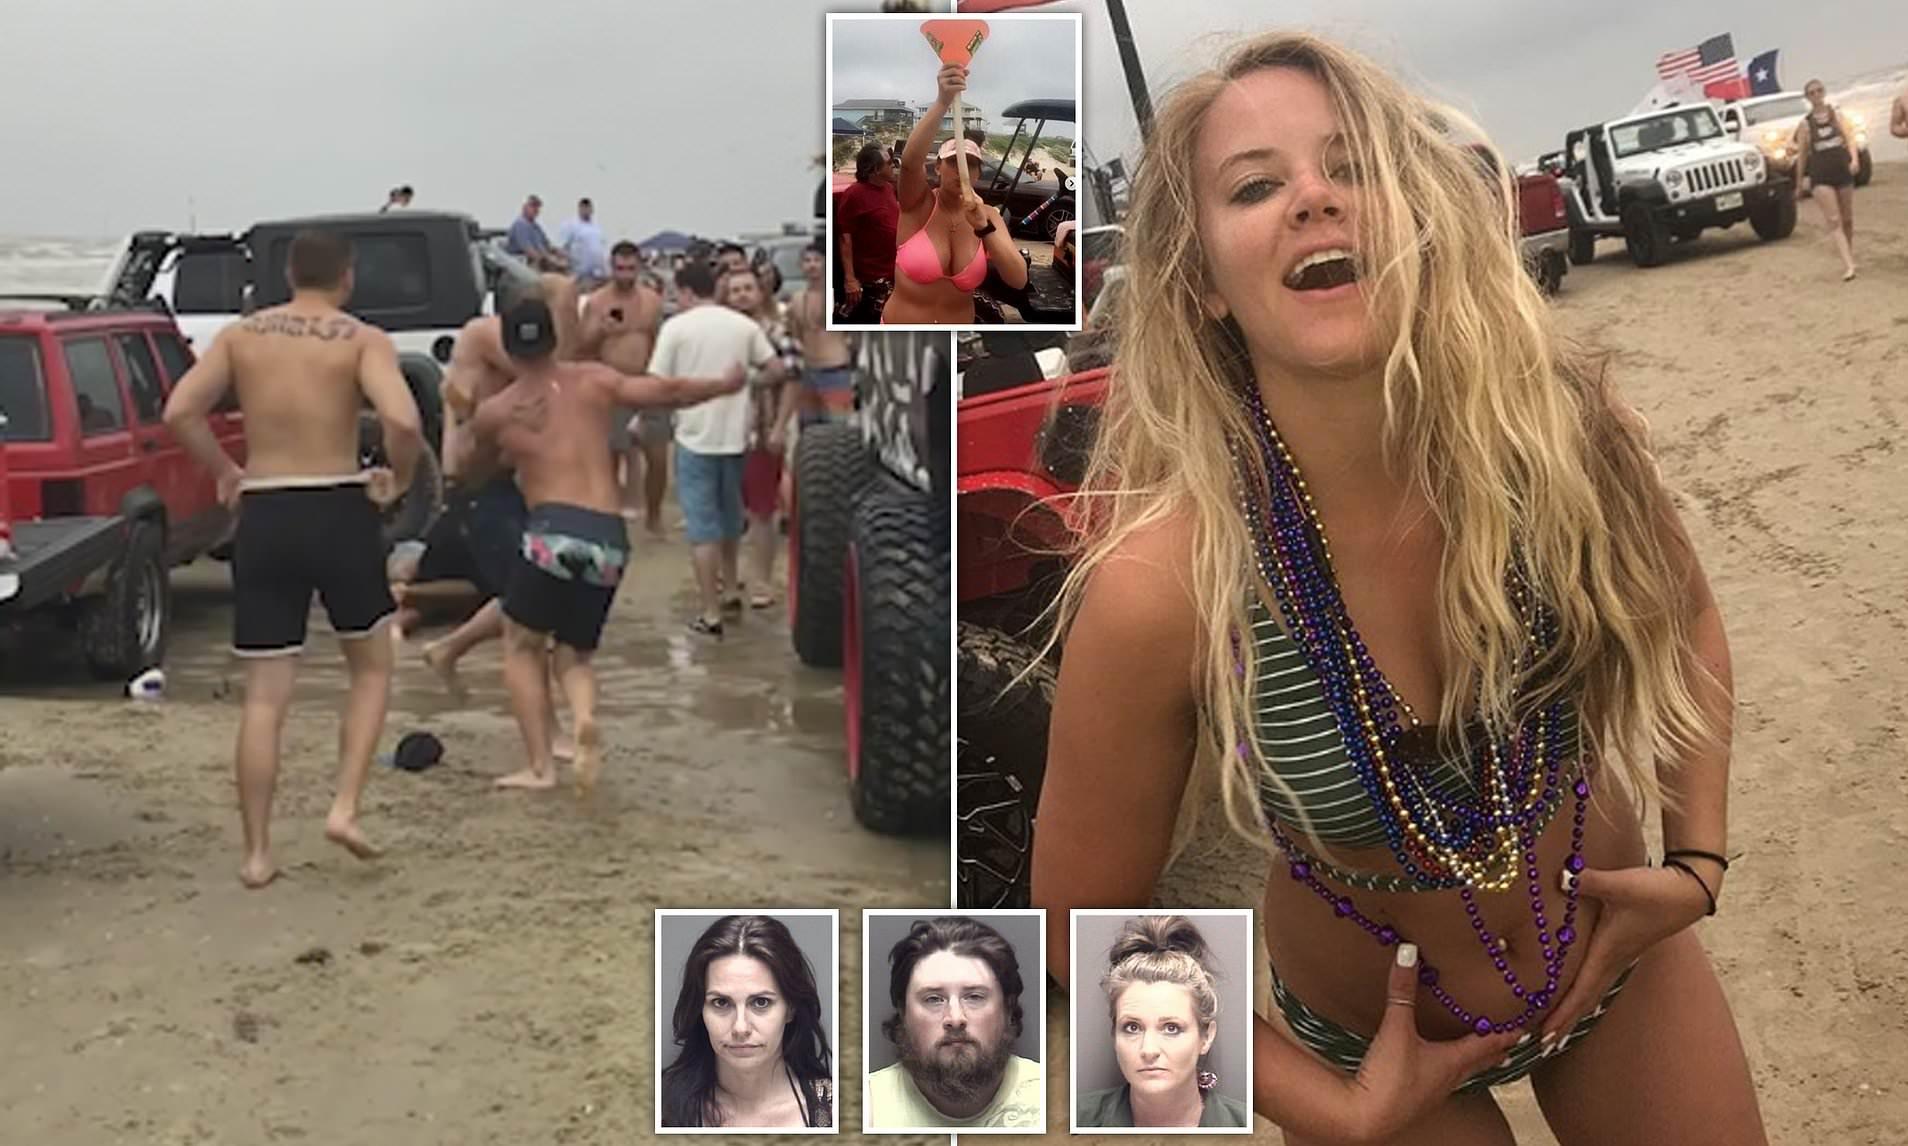 boobs with rednecks paychecks